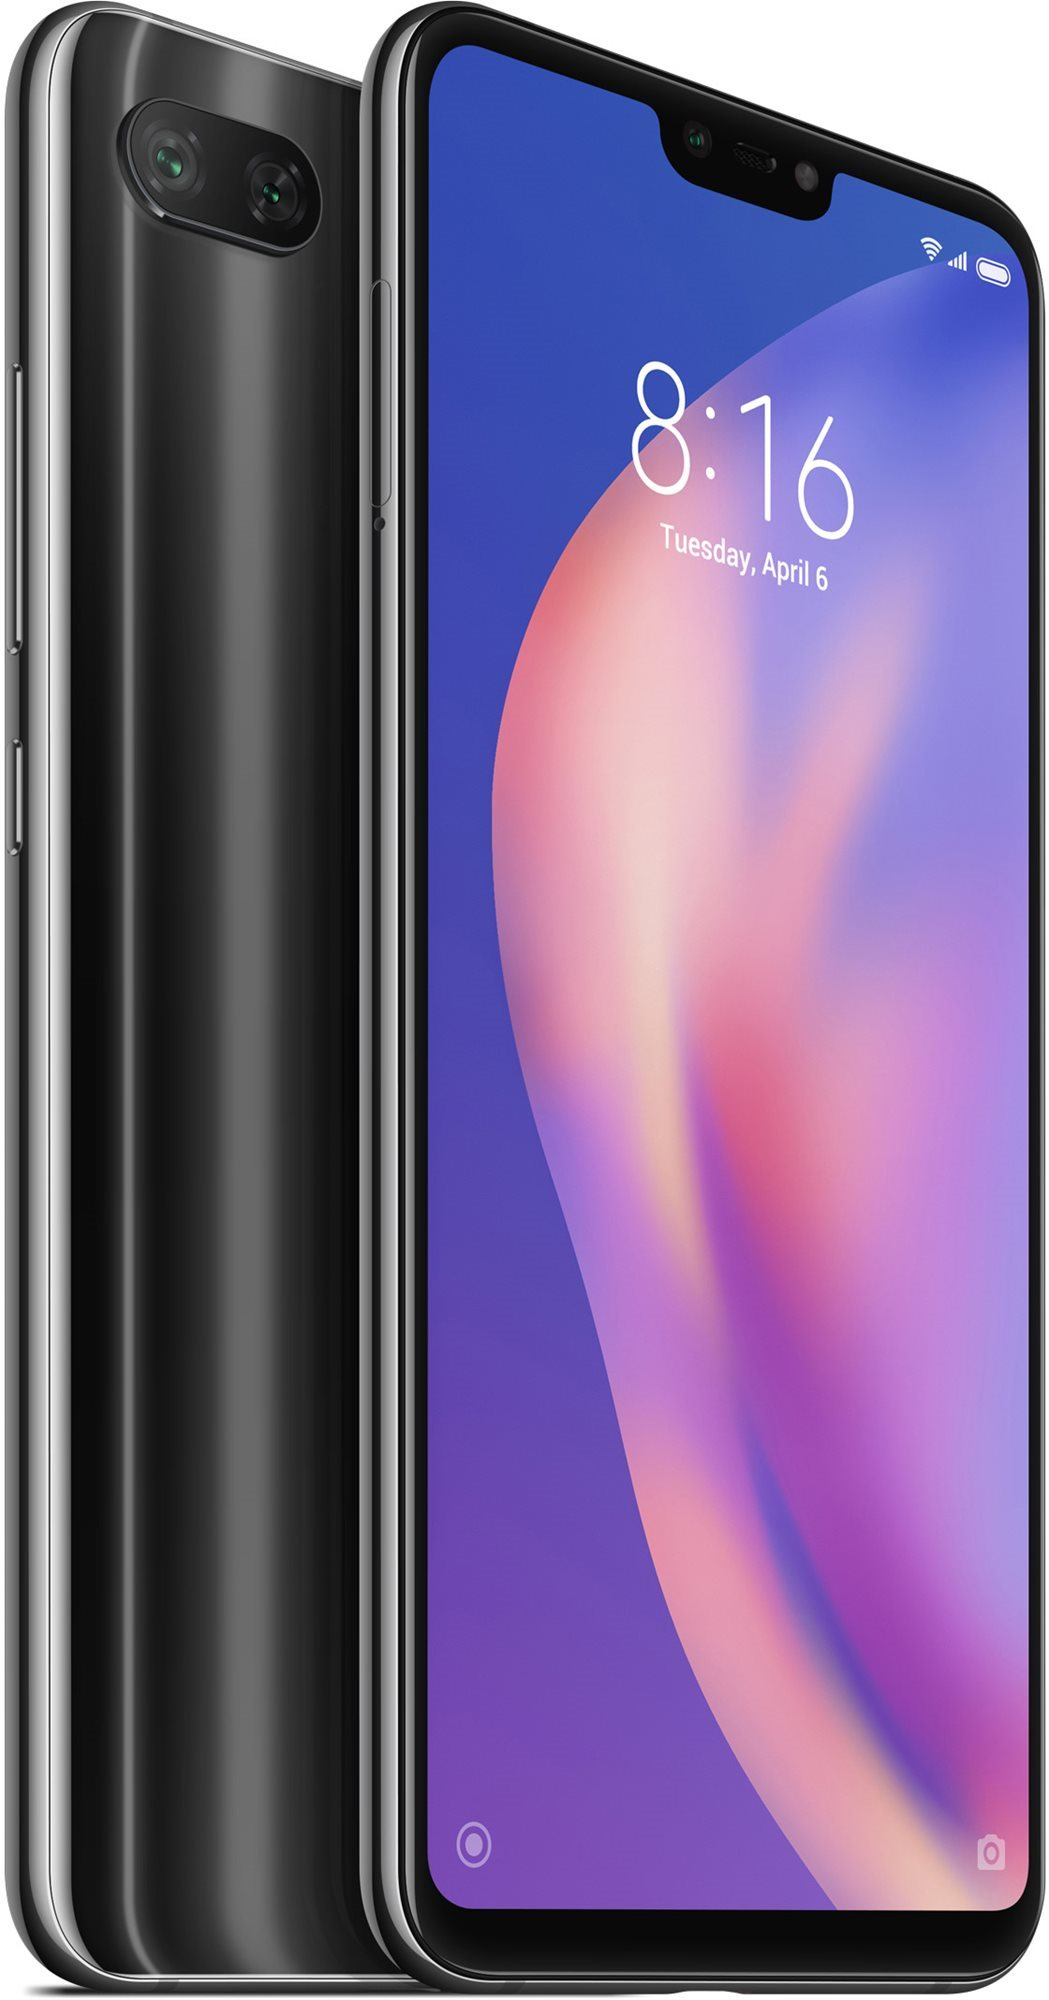 Mobilní telefon Xiaomi Mi 8 Lite